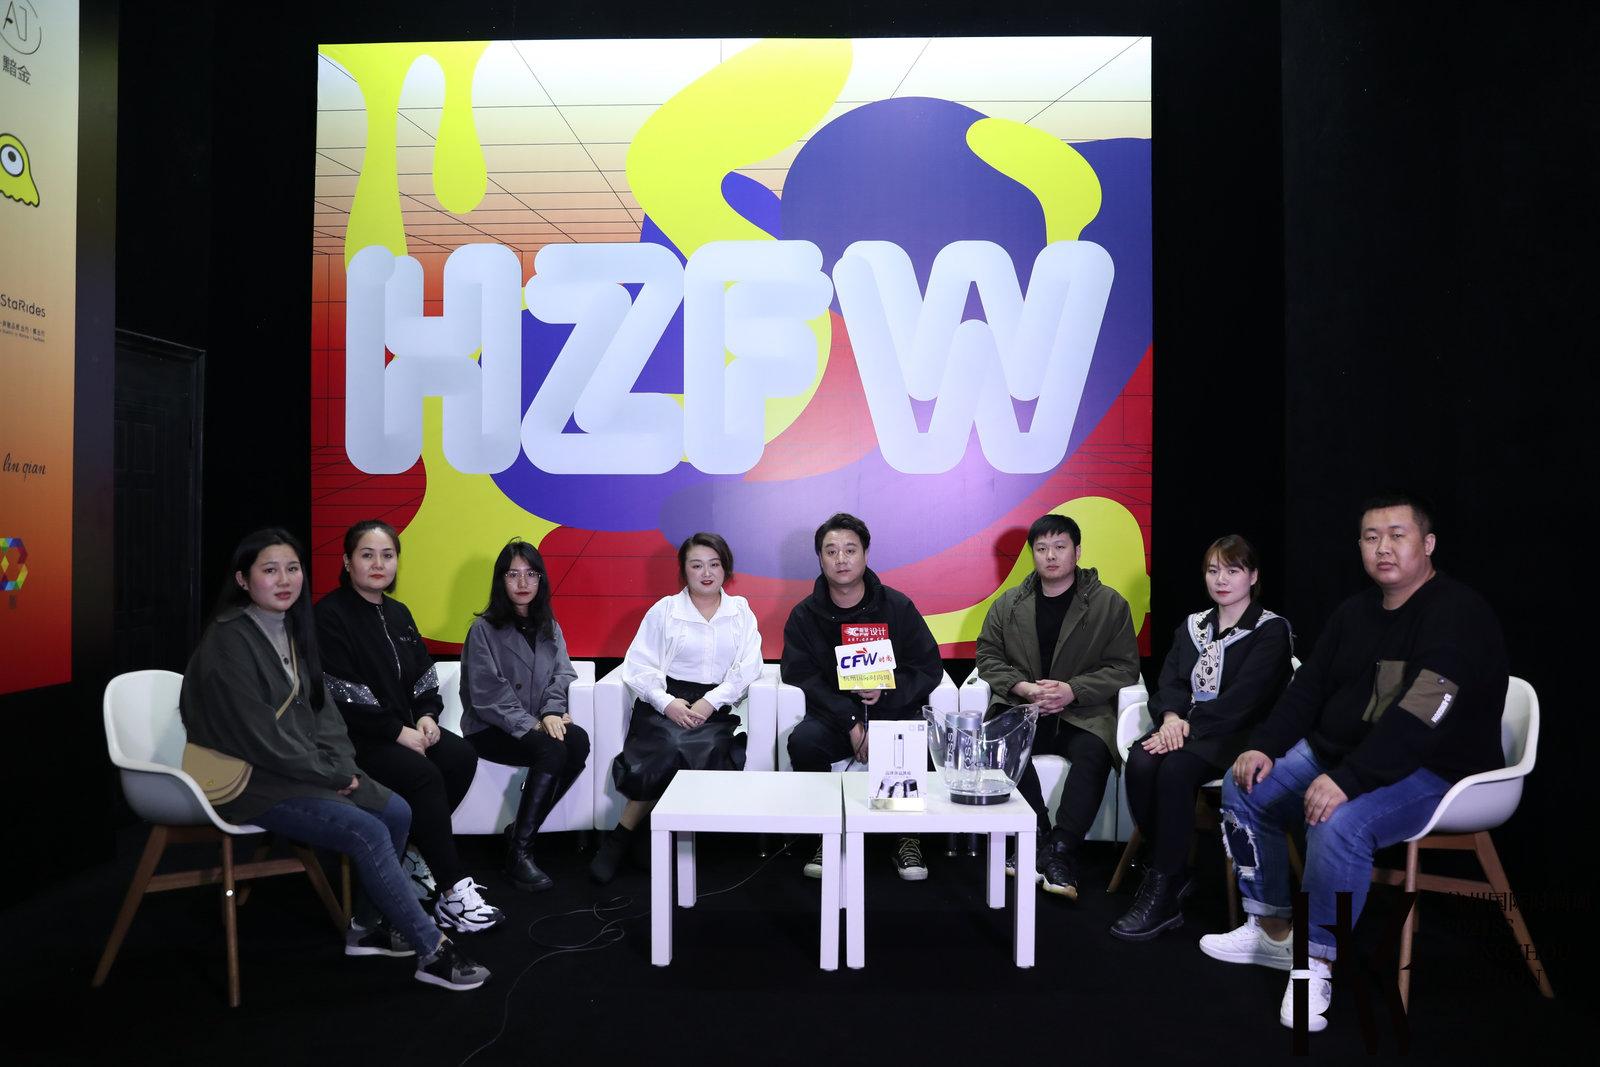 2021ss杭州国际时尚周 | CFW时尚专访蒂萨纳品牌创始人颜烈荣